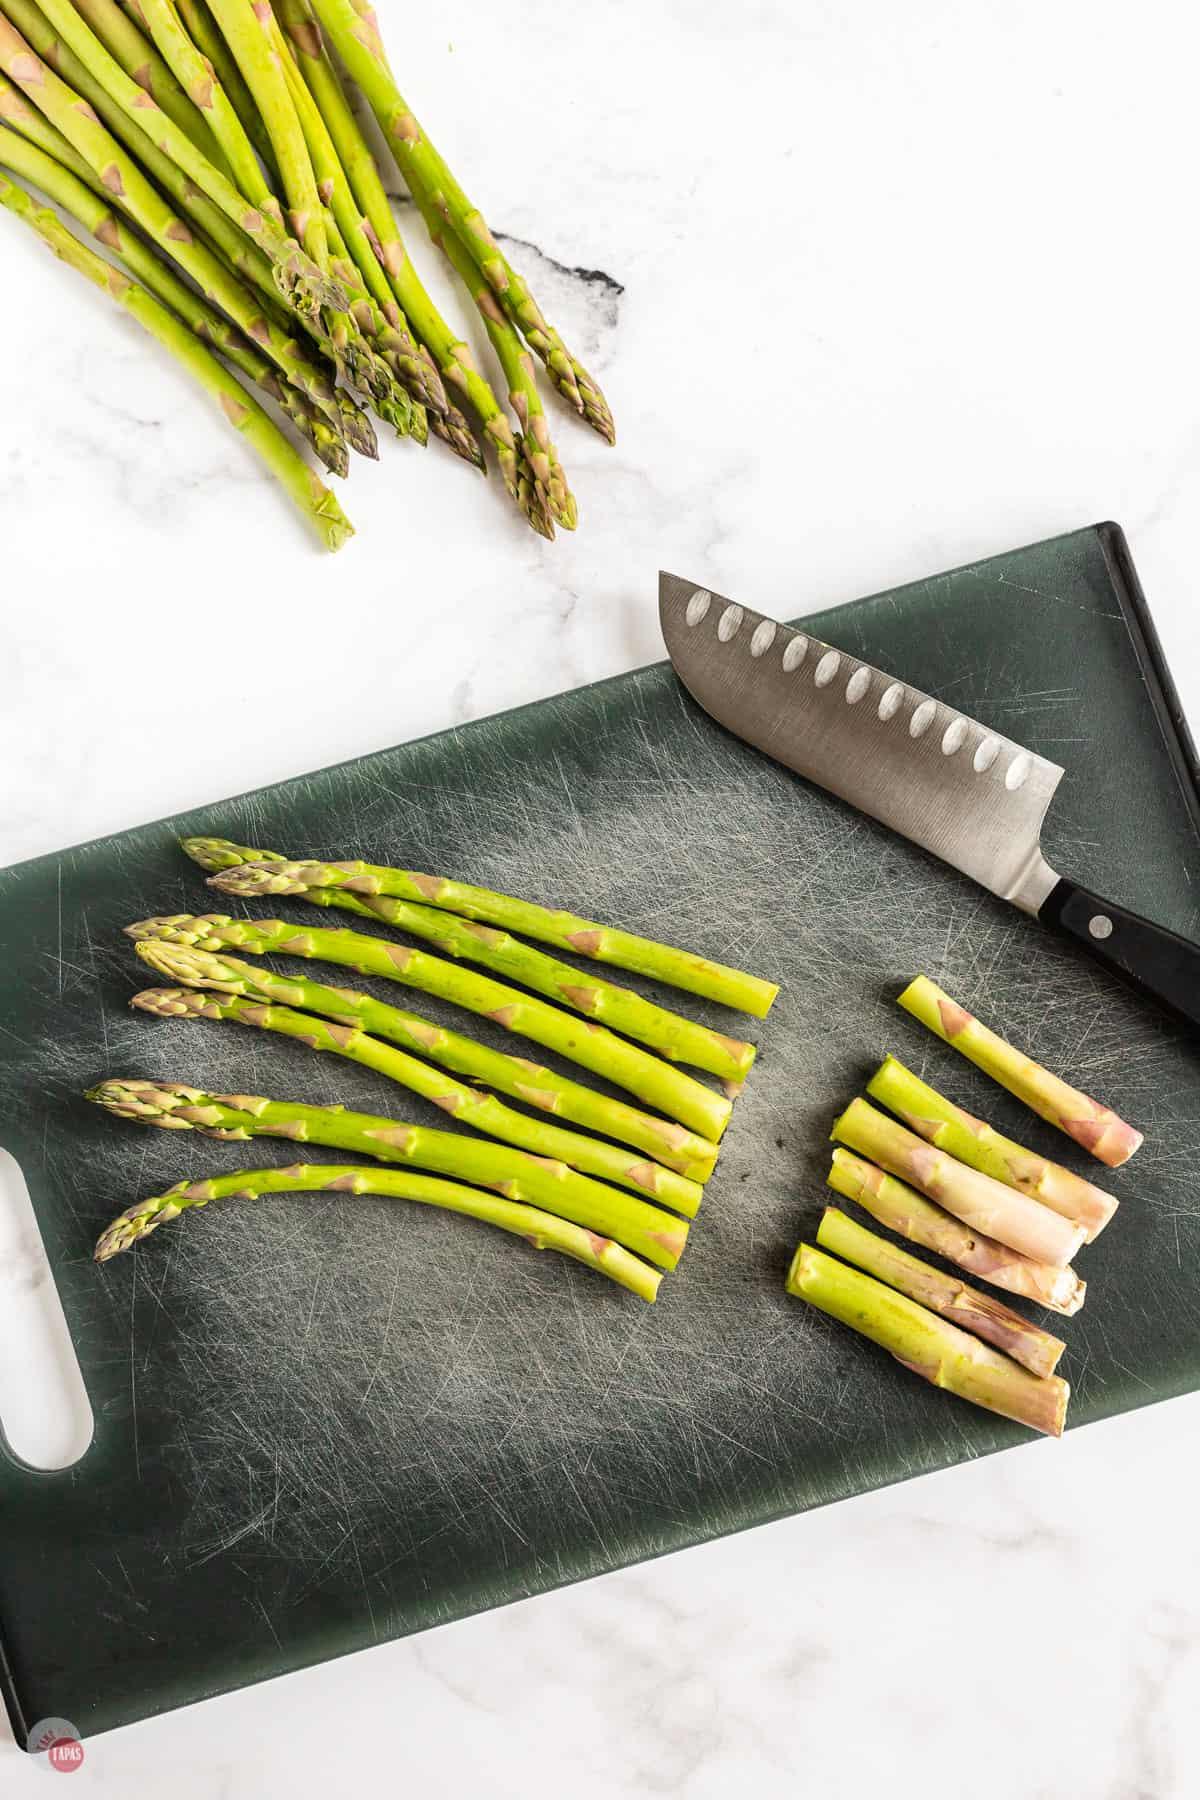 asparagus being cut on a board